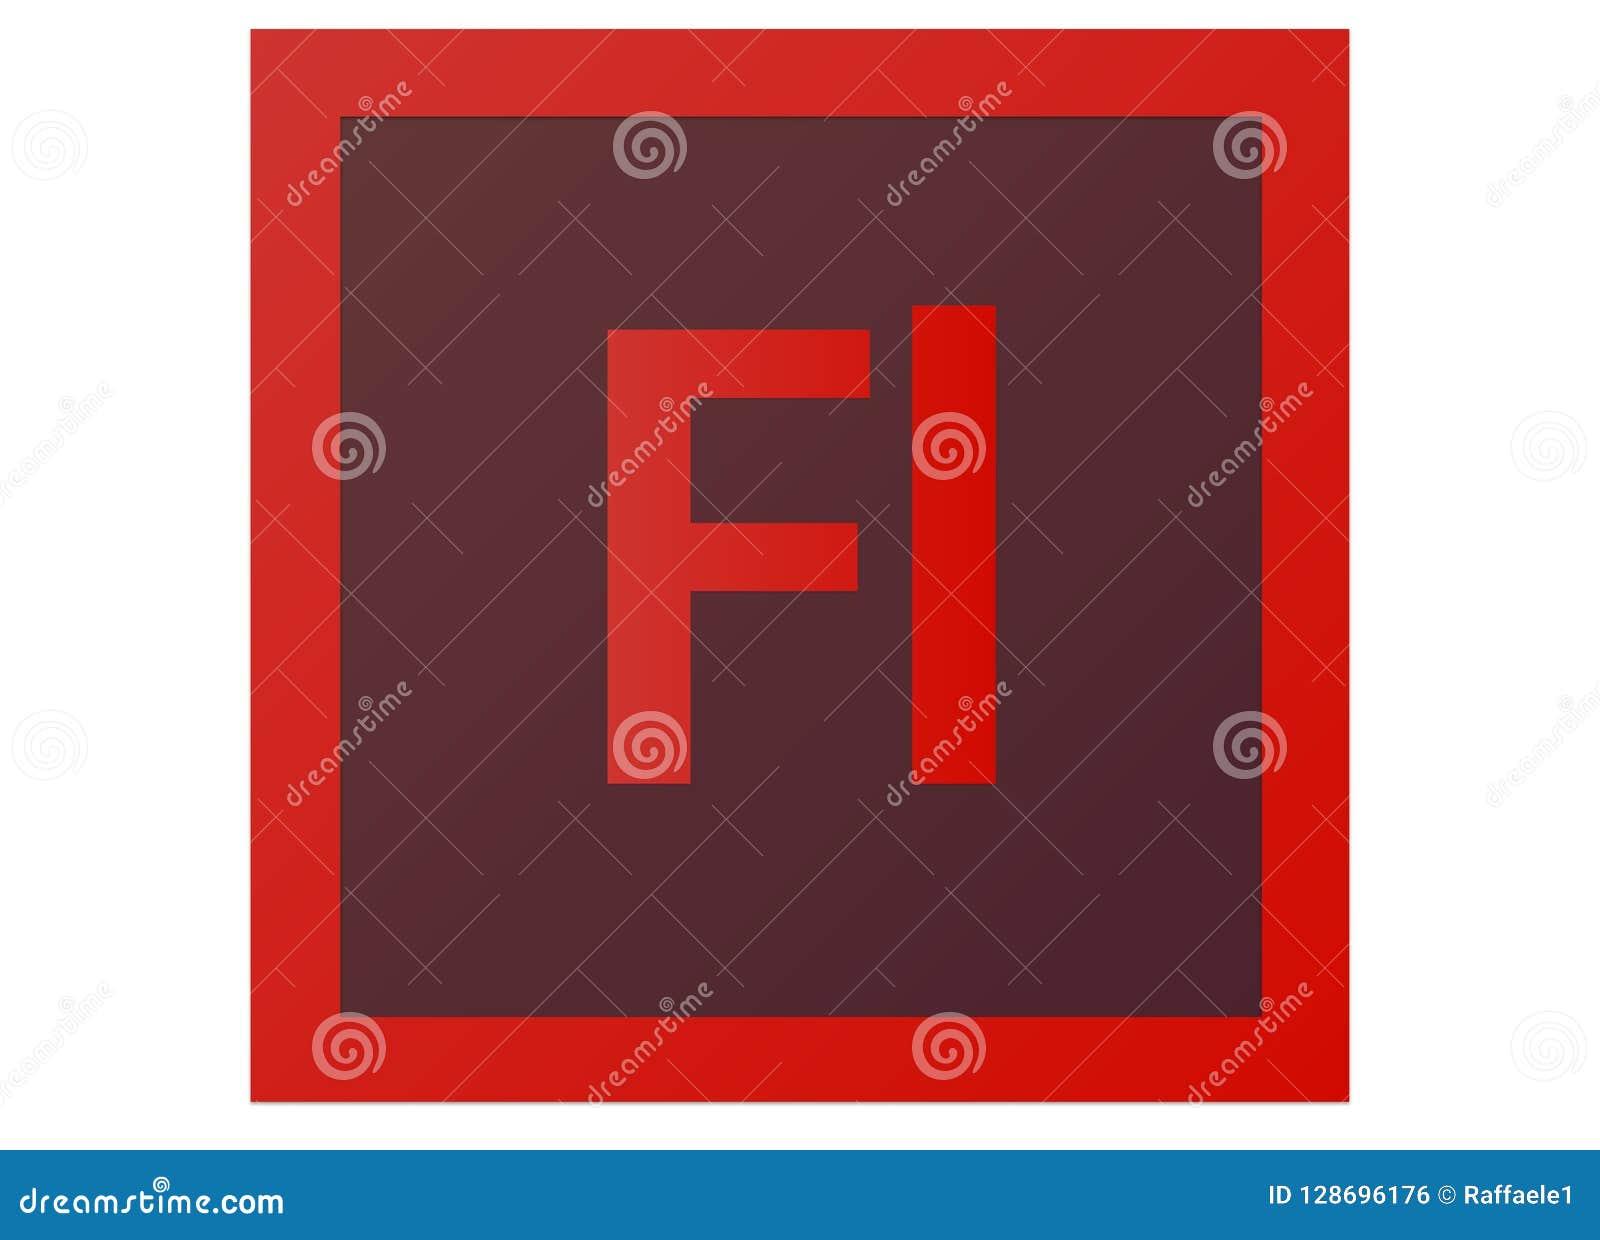 Adobe Flash CS6 Price Tag $109.95